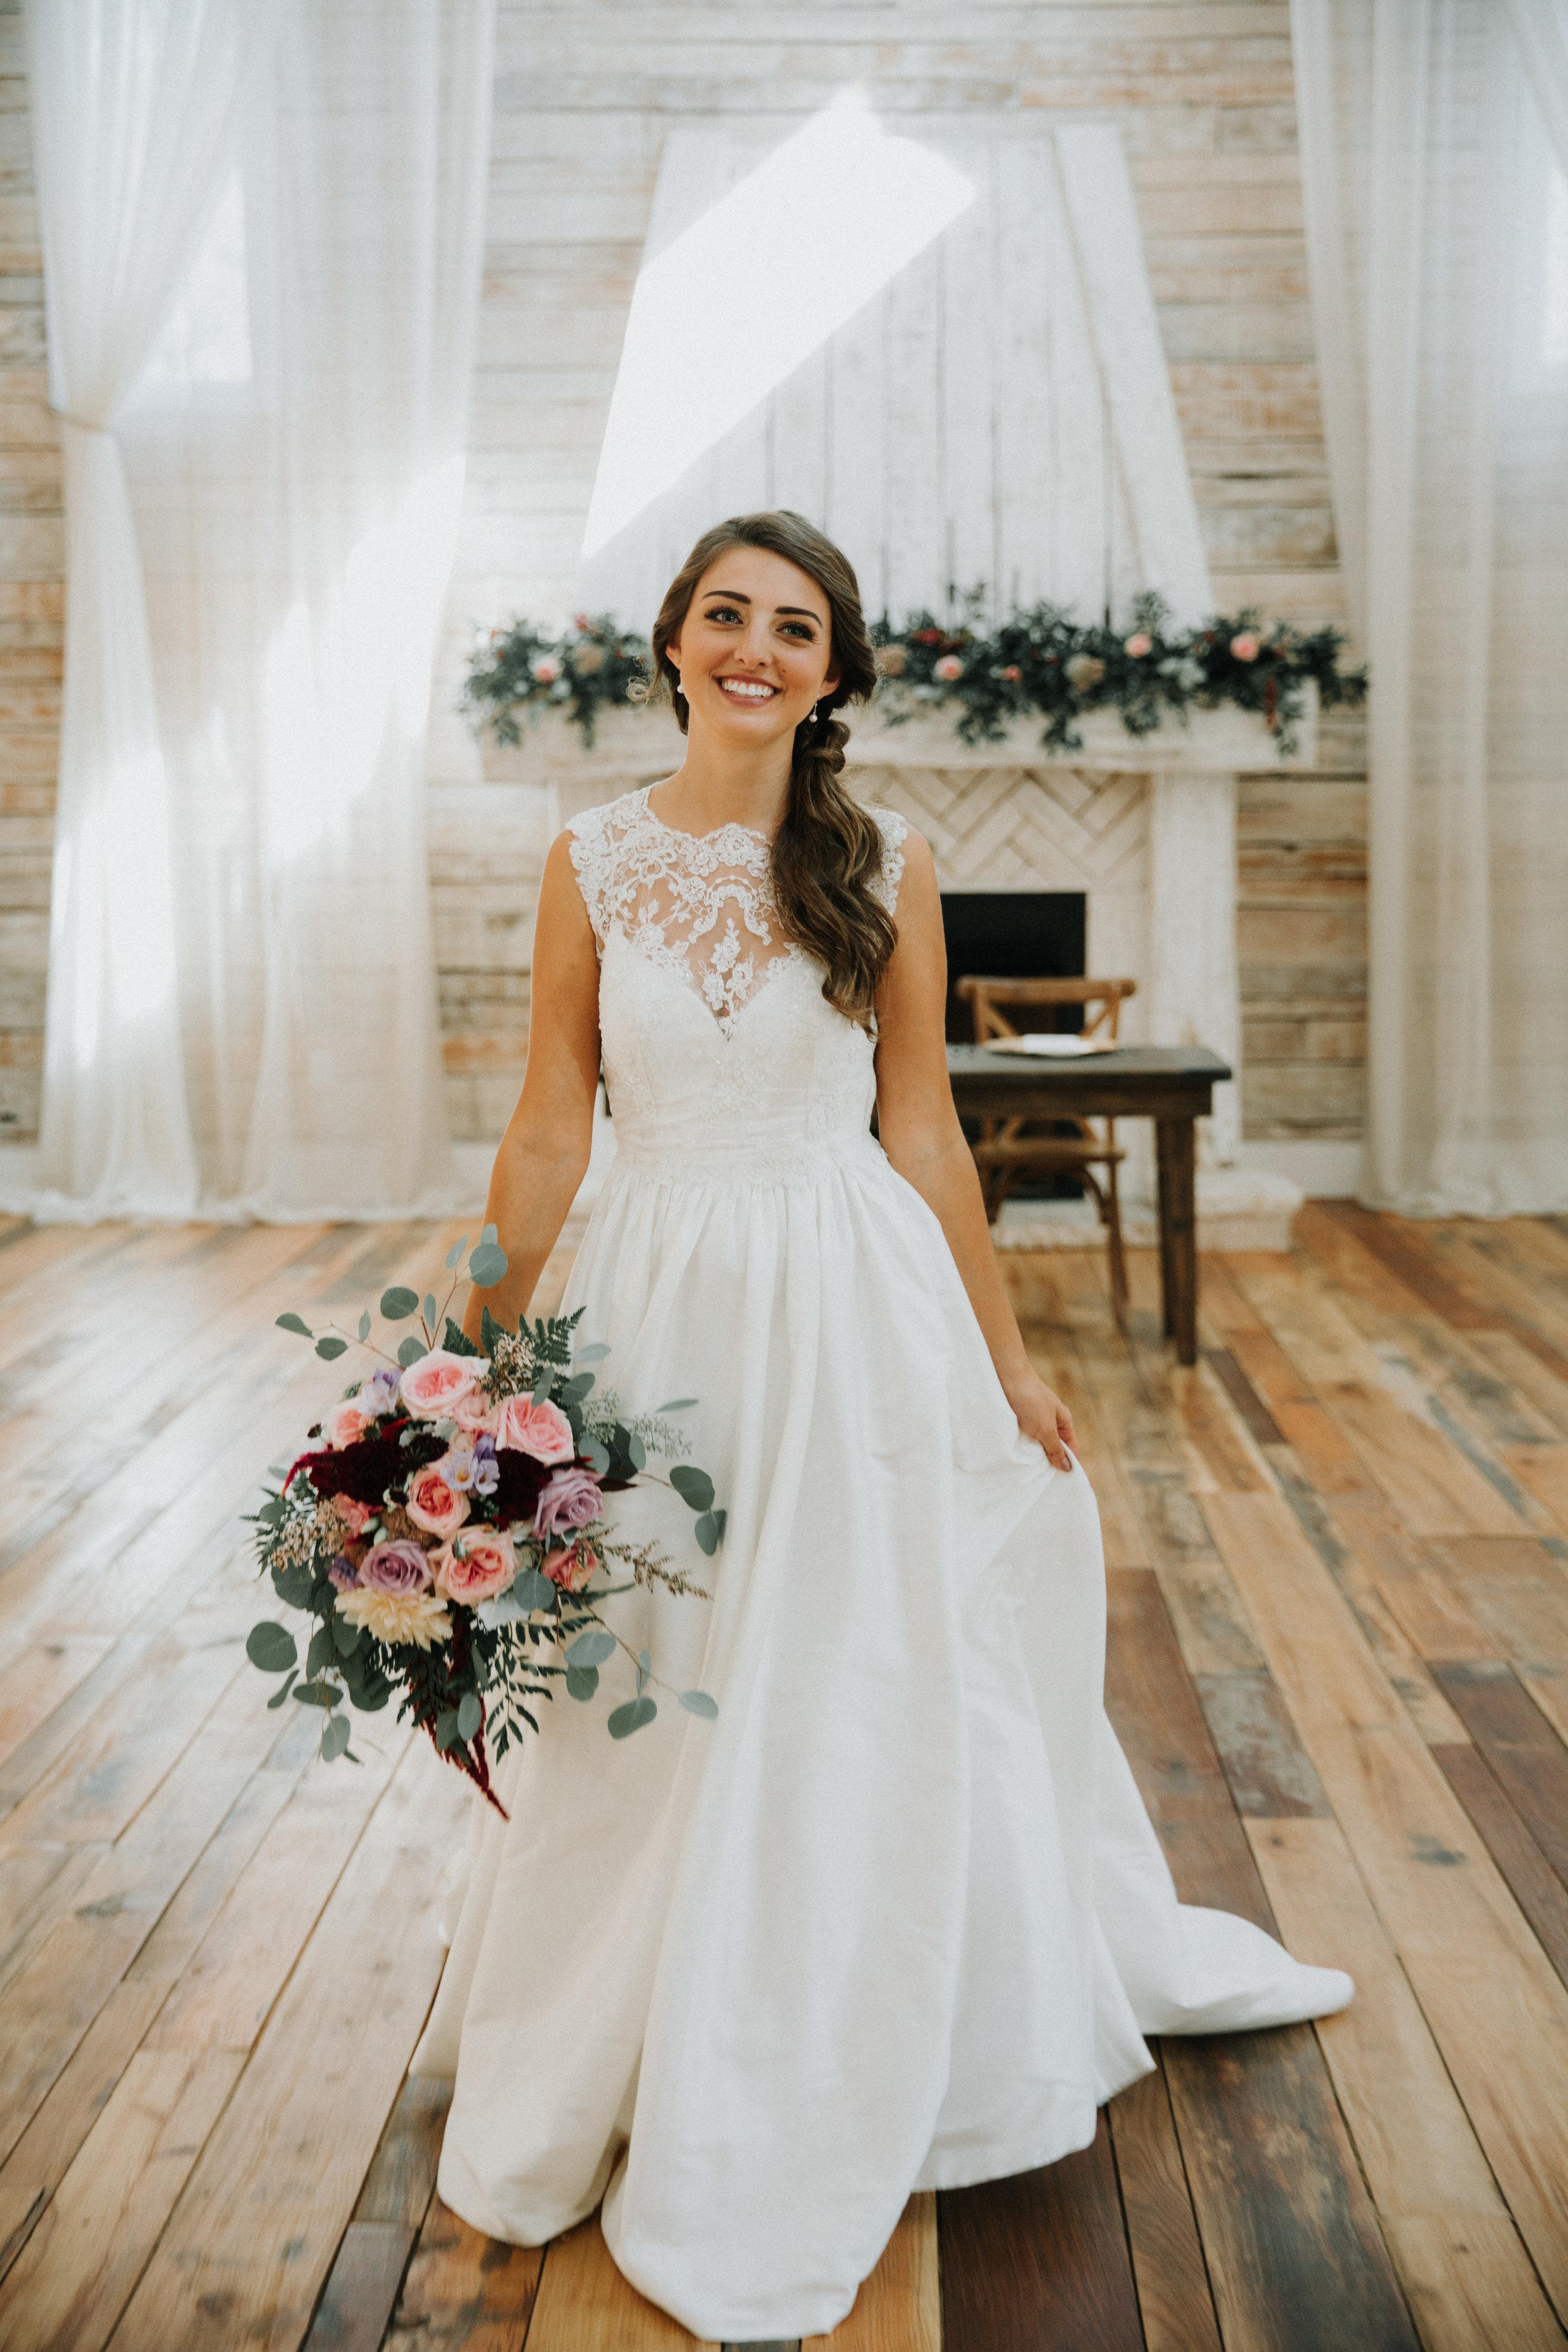 Gorgeous Wedding Dresses - Athens, Tennessee Barn Wedding -- The Overwhelmed Bride Wedding Blog